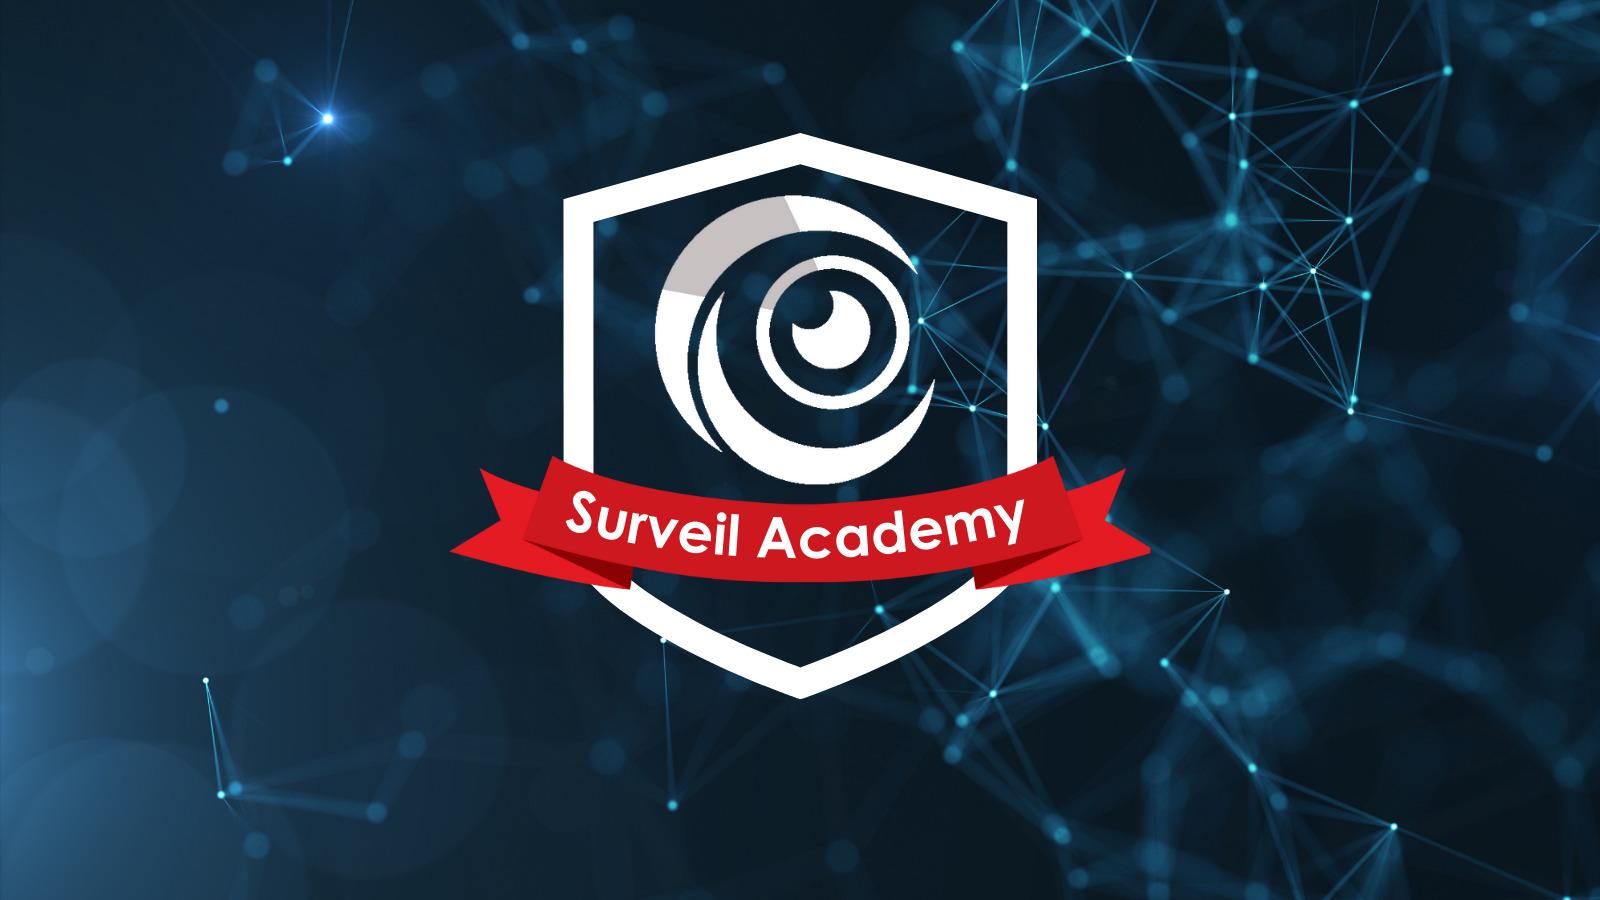 Surveil Academy